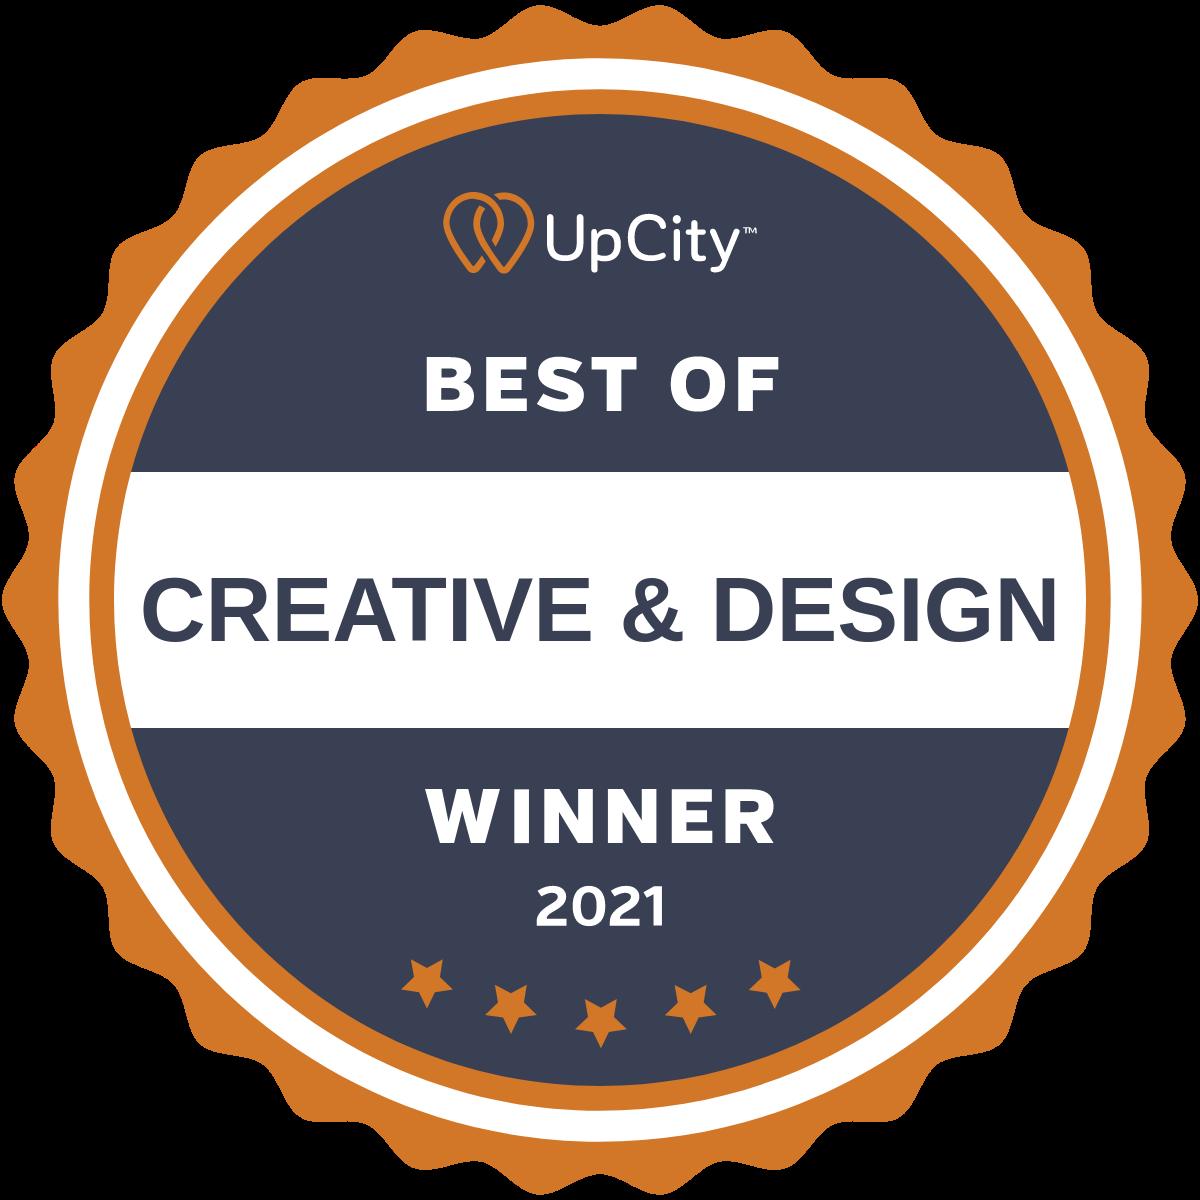 2021 Best of Creative & Design